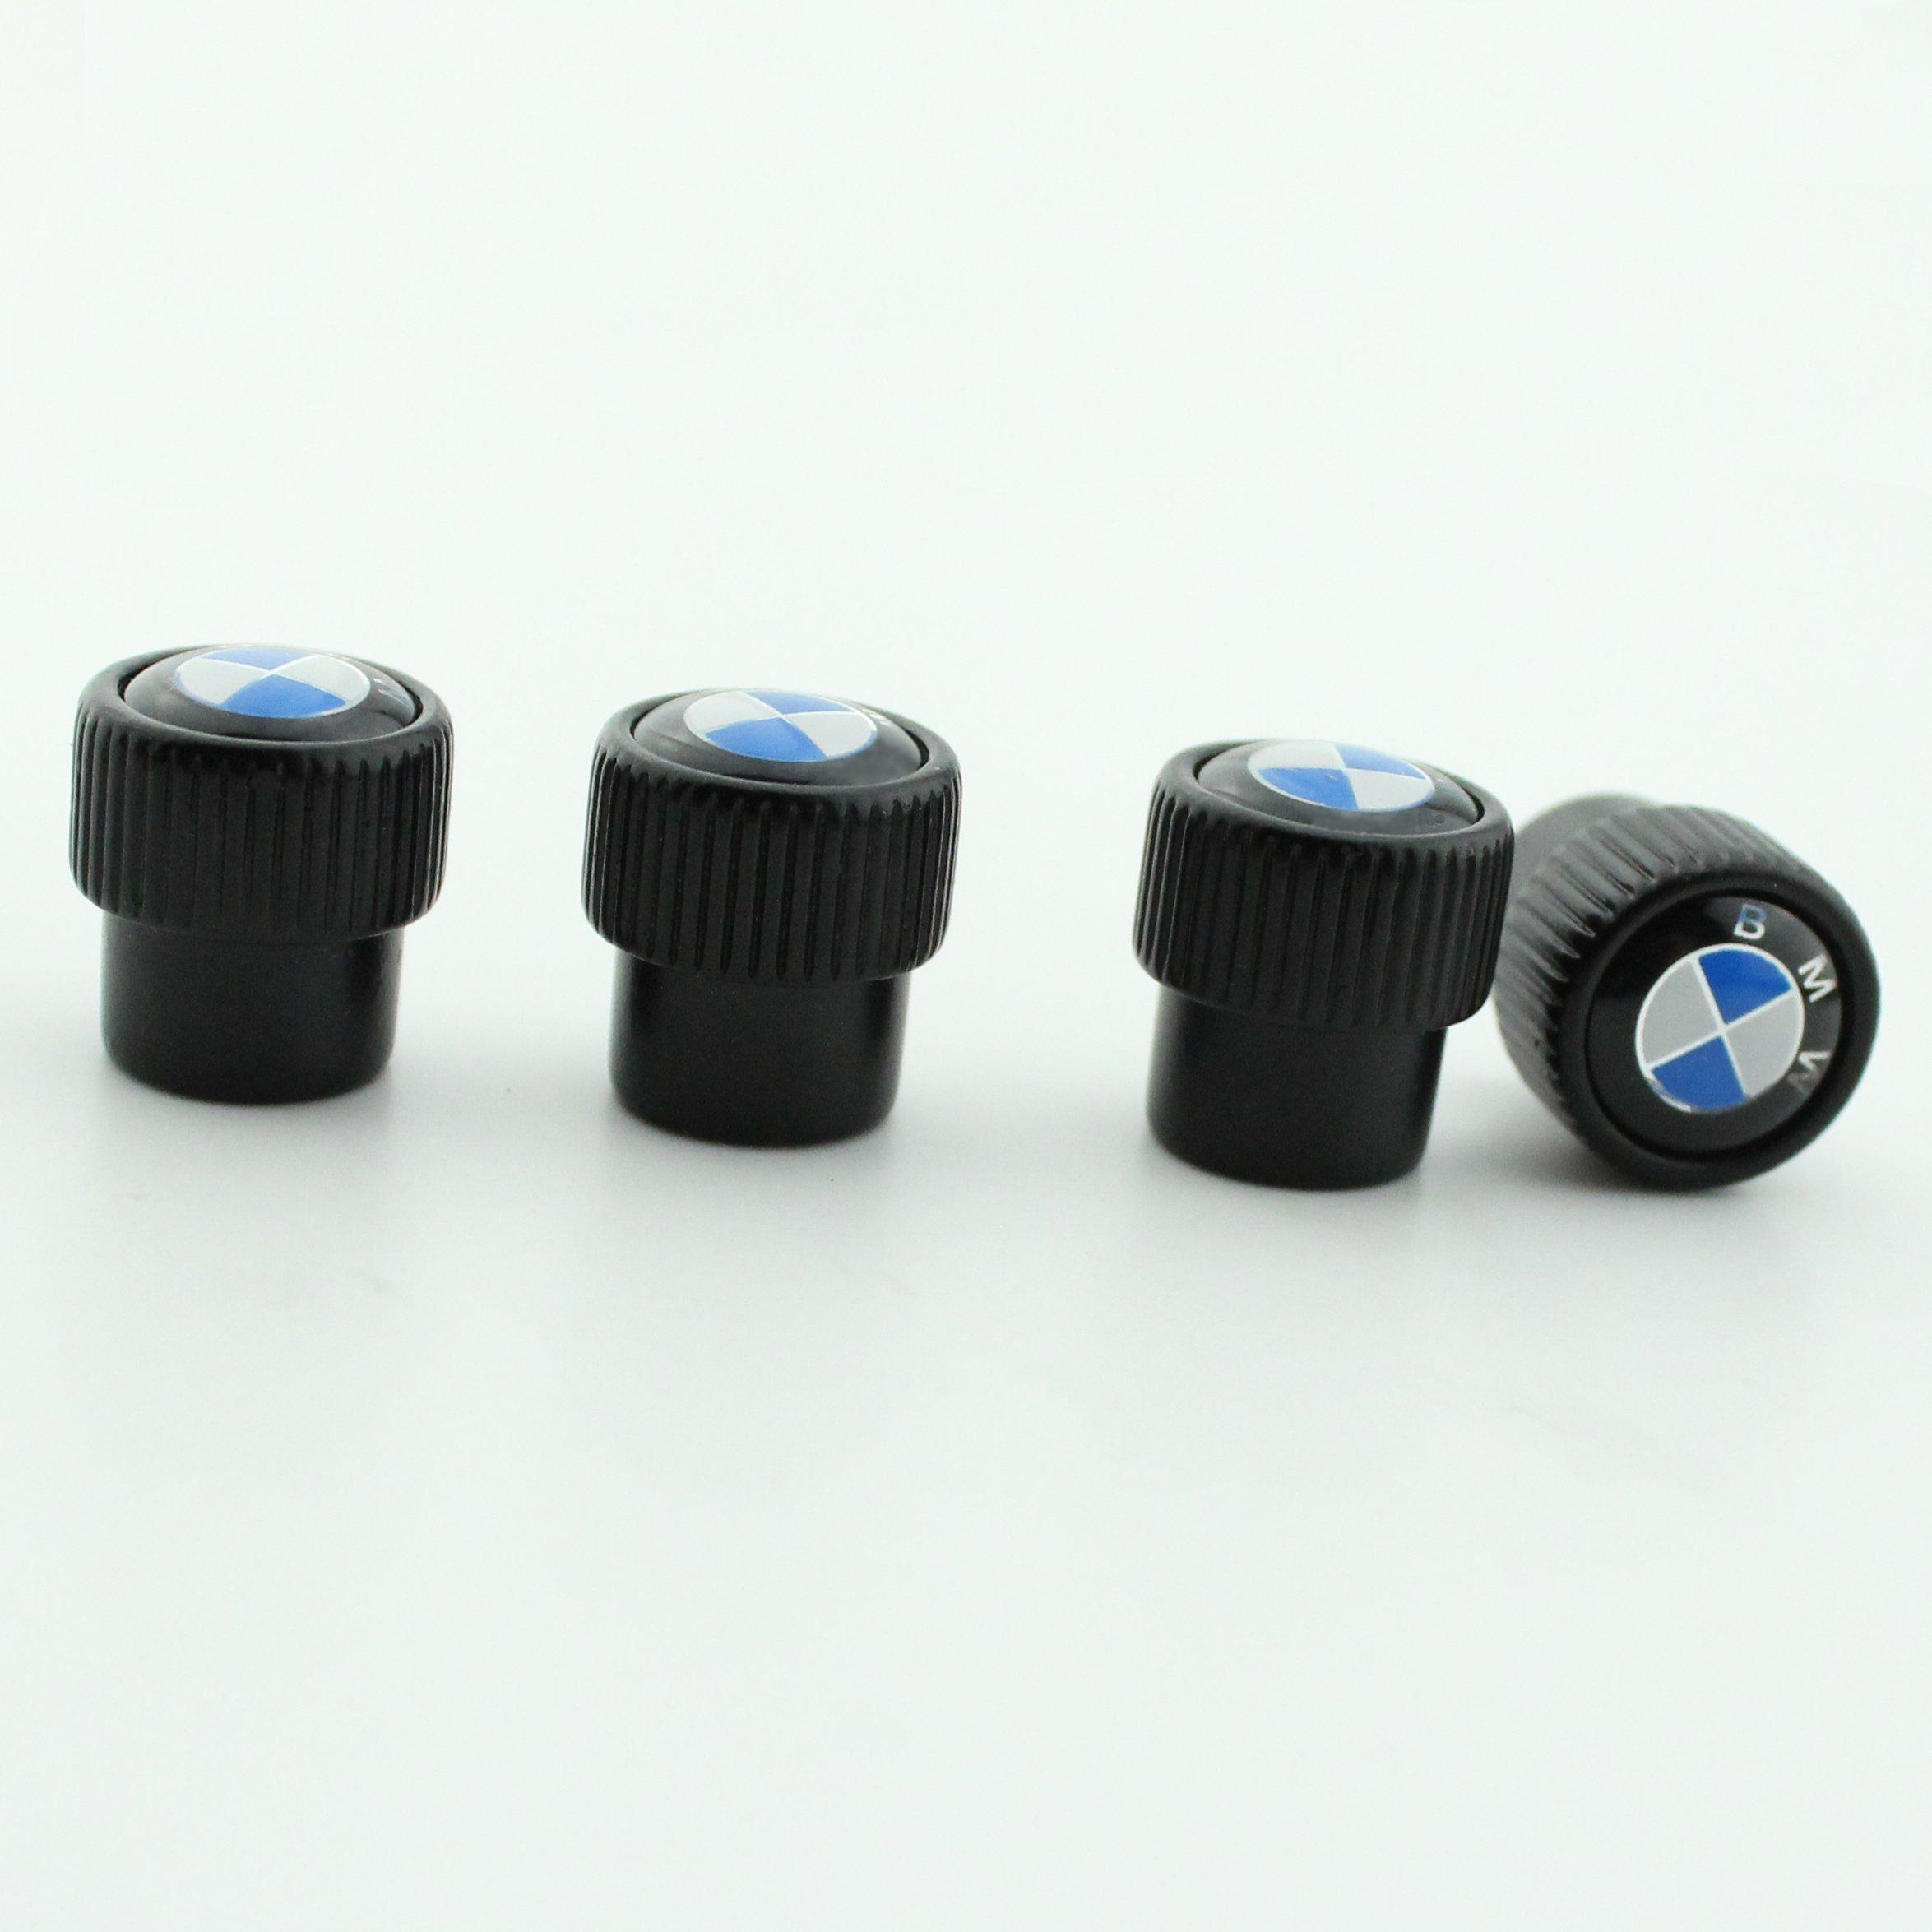 MirosCar Valve Stem Caps Zinc Alloy Plating Chrome Tire Valve Stem Valve Caps For BMW (Set of 4)